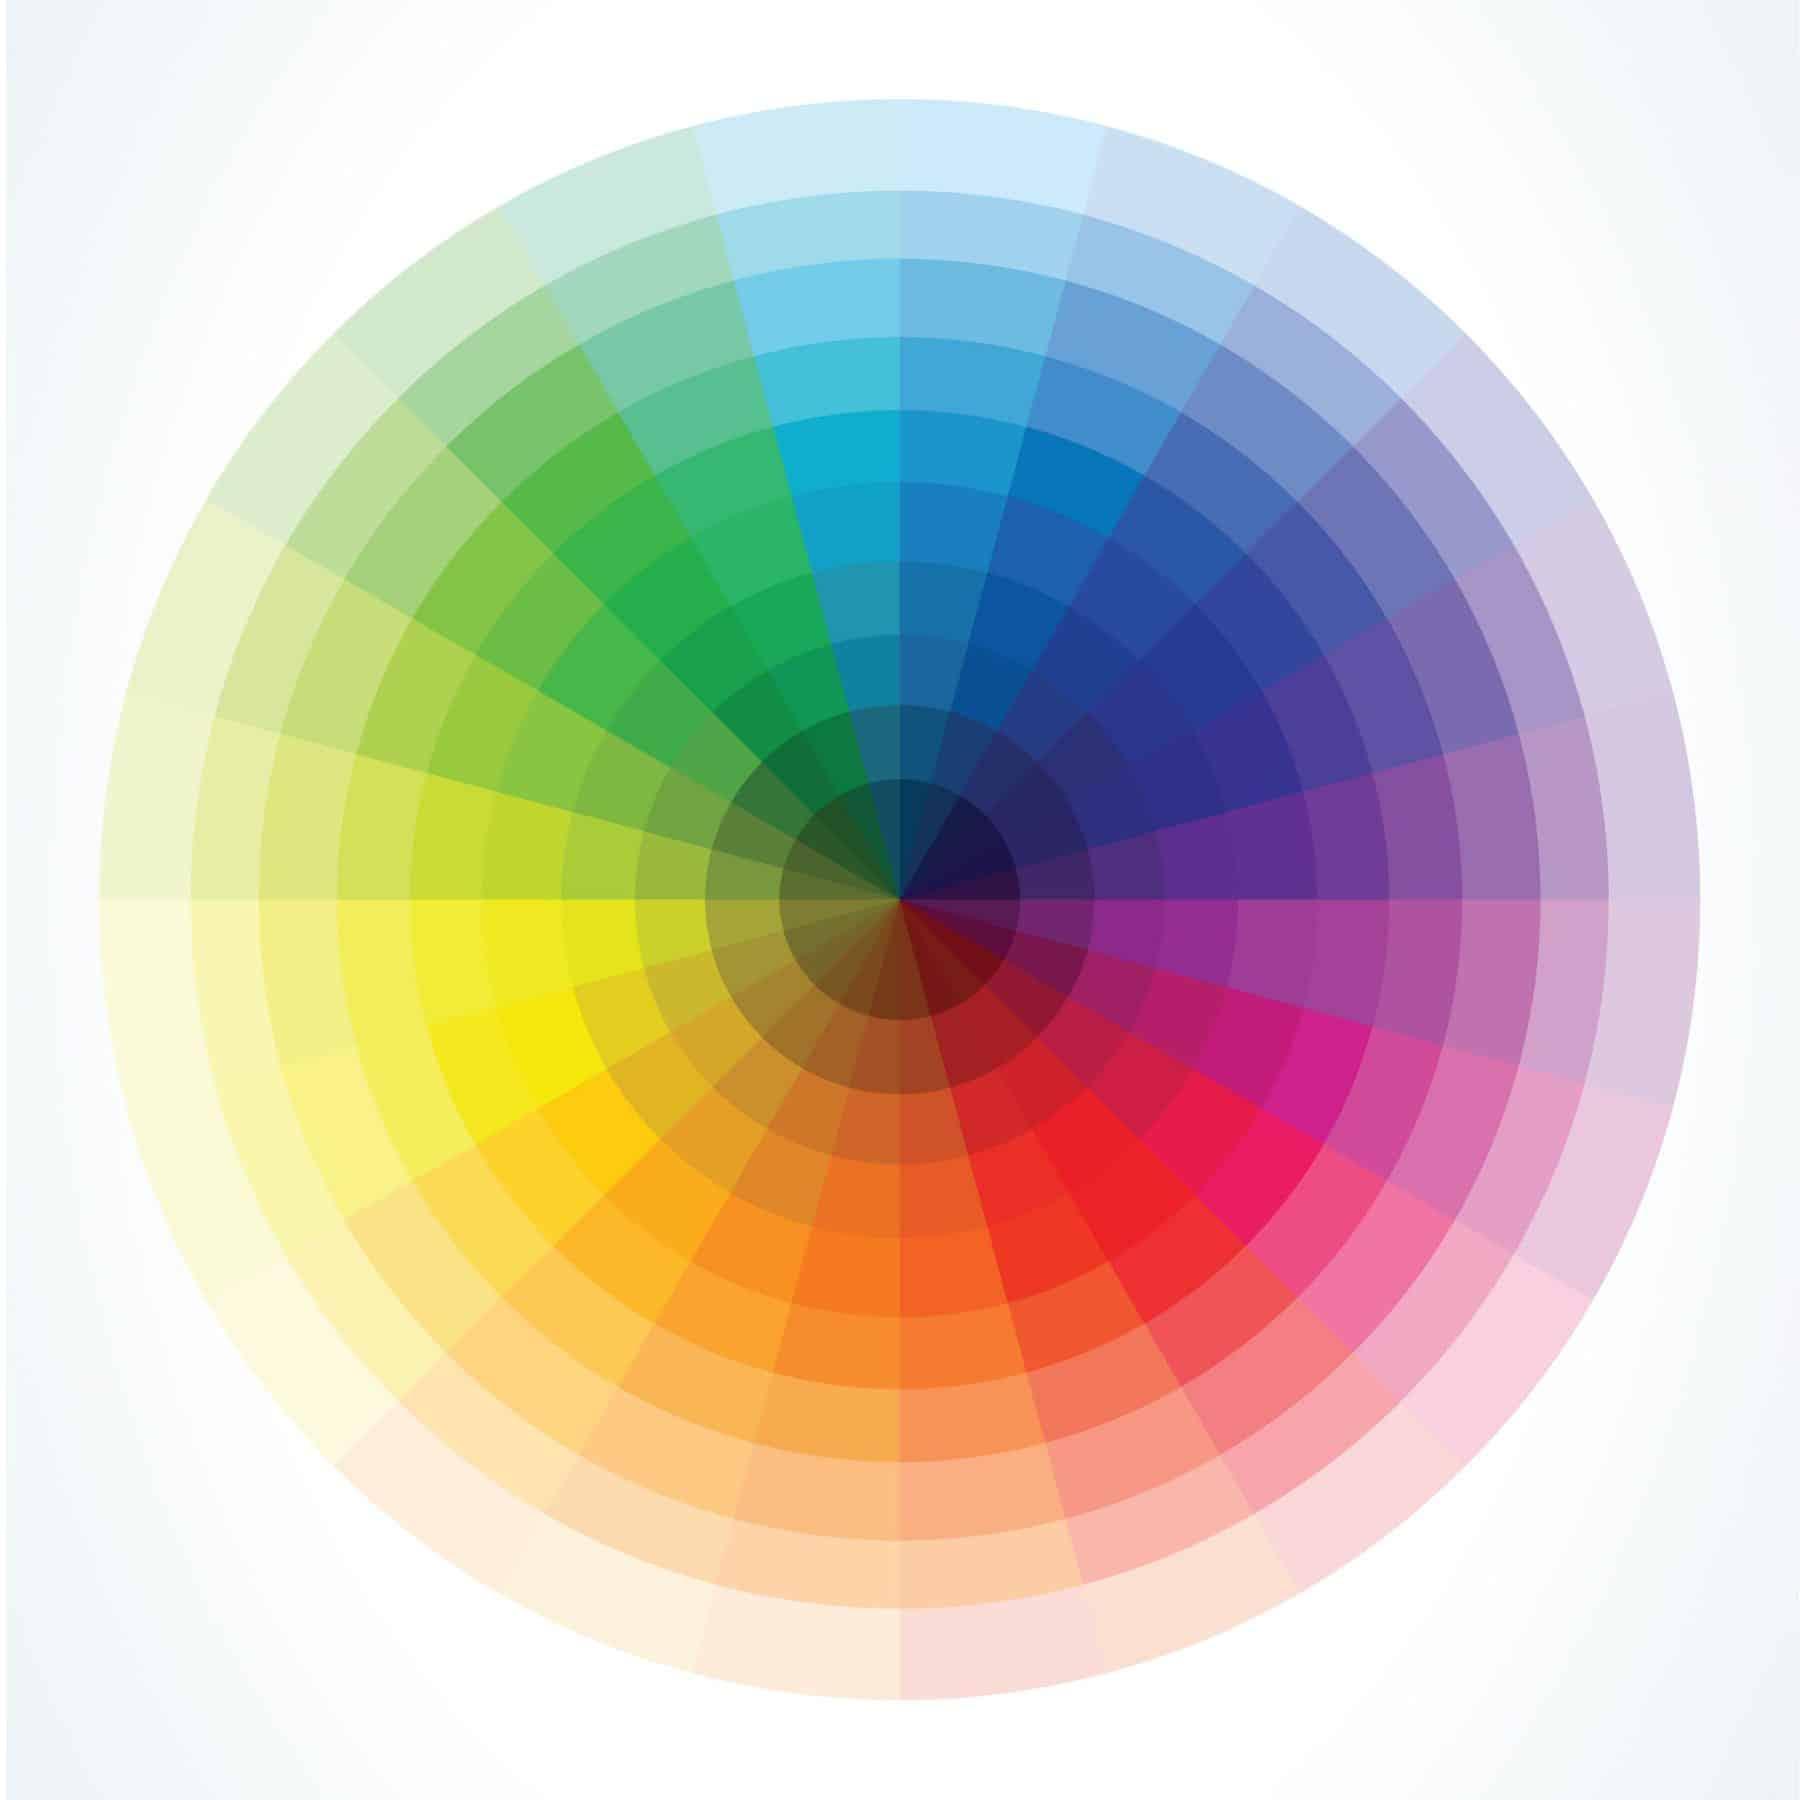 color wheel in graphic design